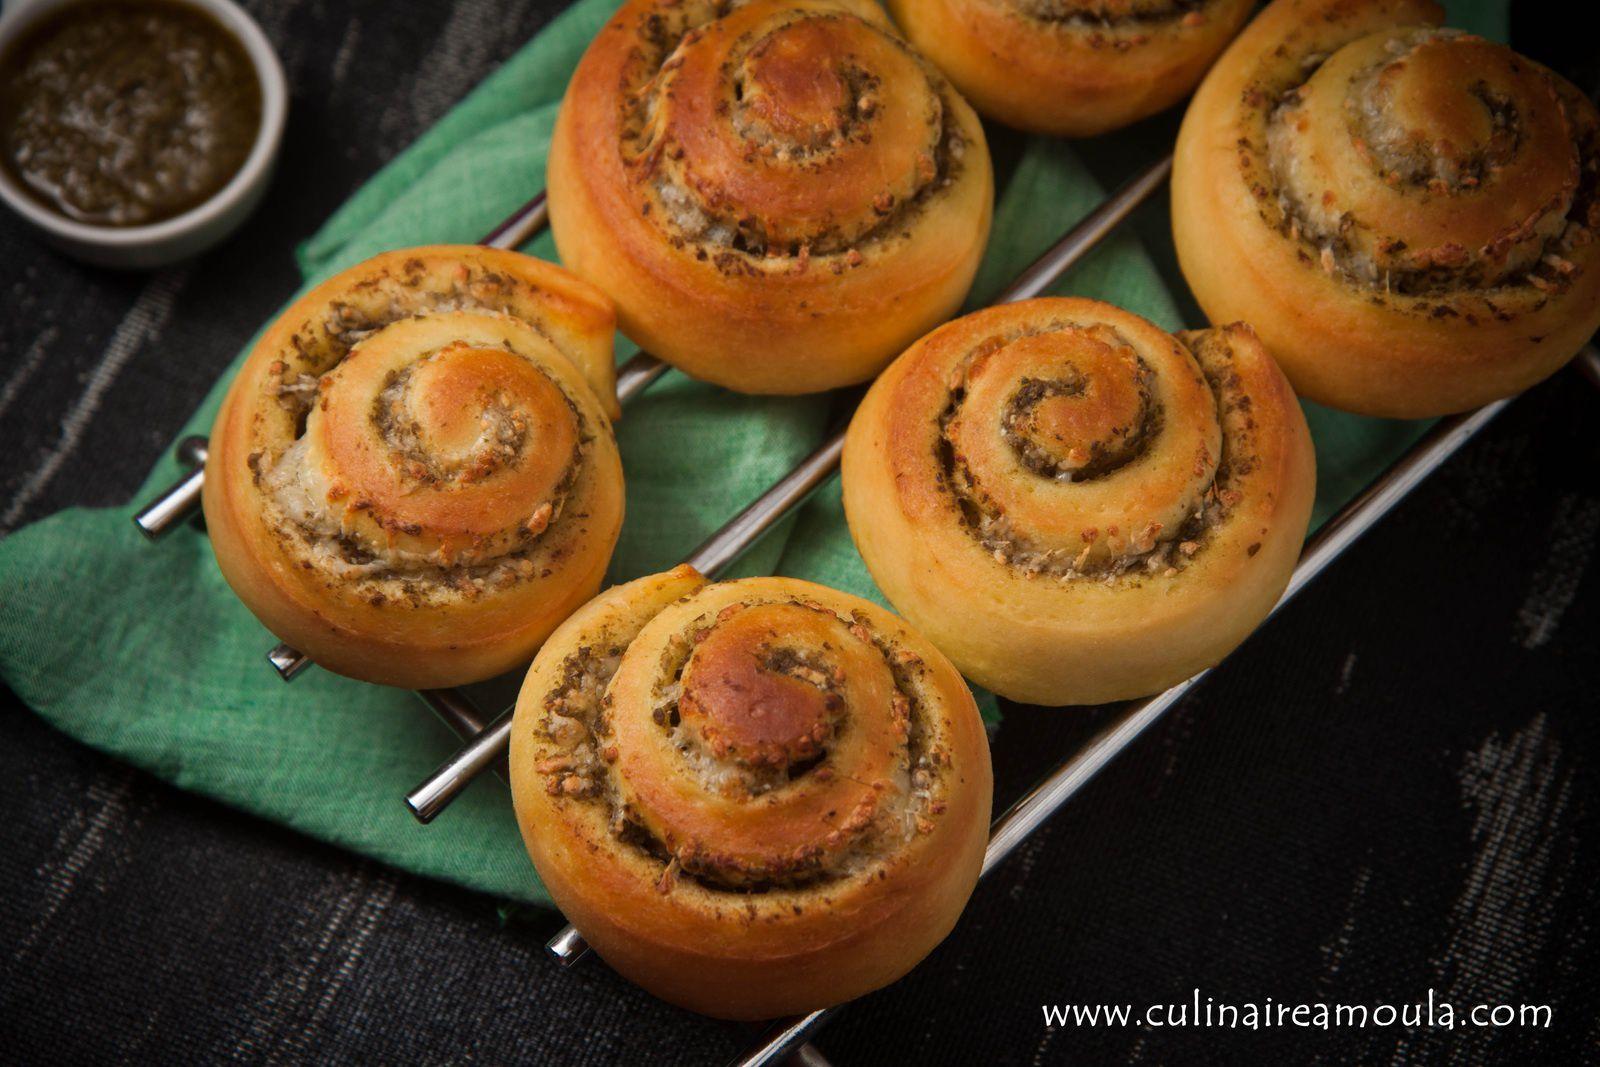 Petits pains escargots au pesto et mozzarella